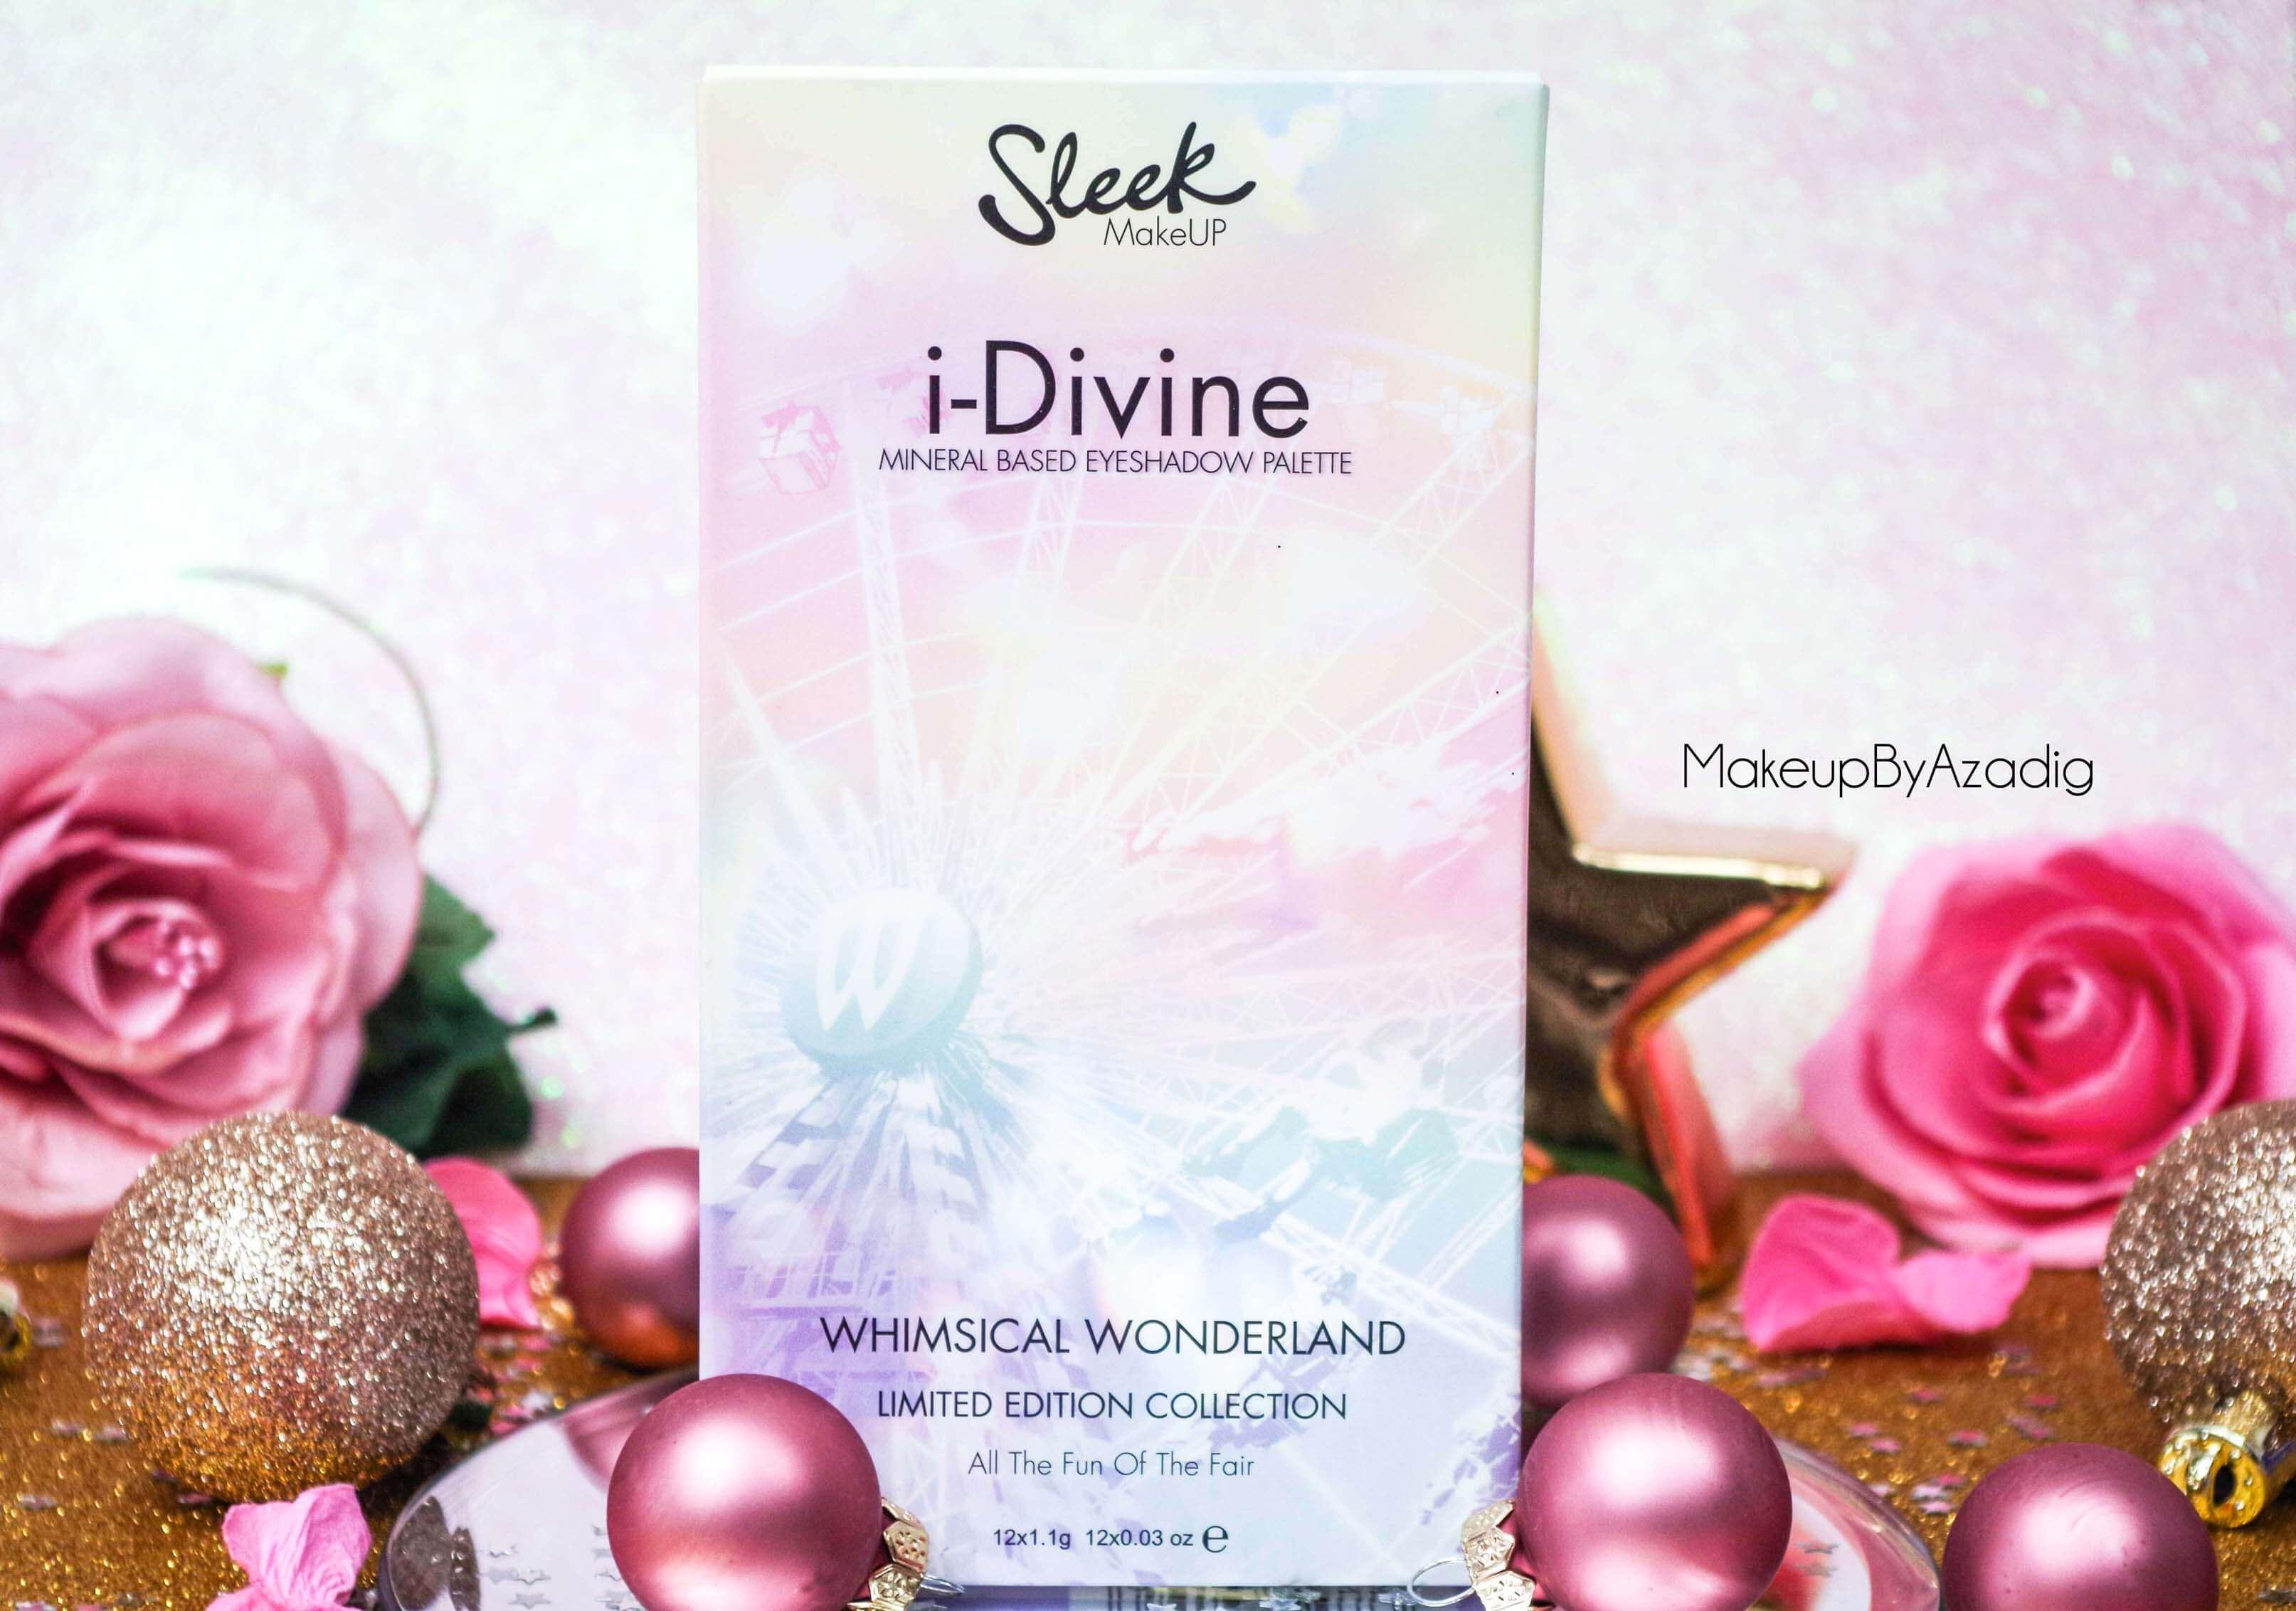 review-palette-sleek-makeup-idivine-pas-cher-sephora-couleurs-allthefunofthefair-code-promo-sephora-paris-makeupbyazadig-packaging-2